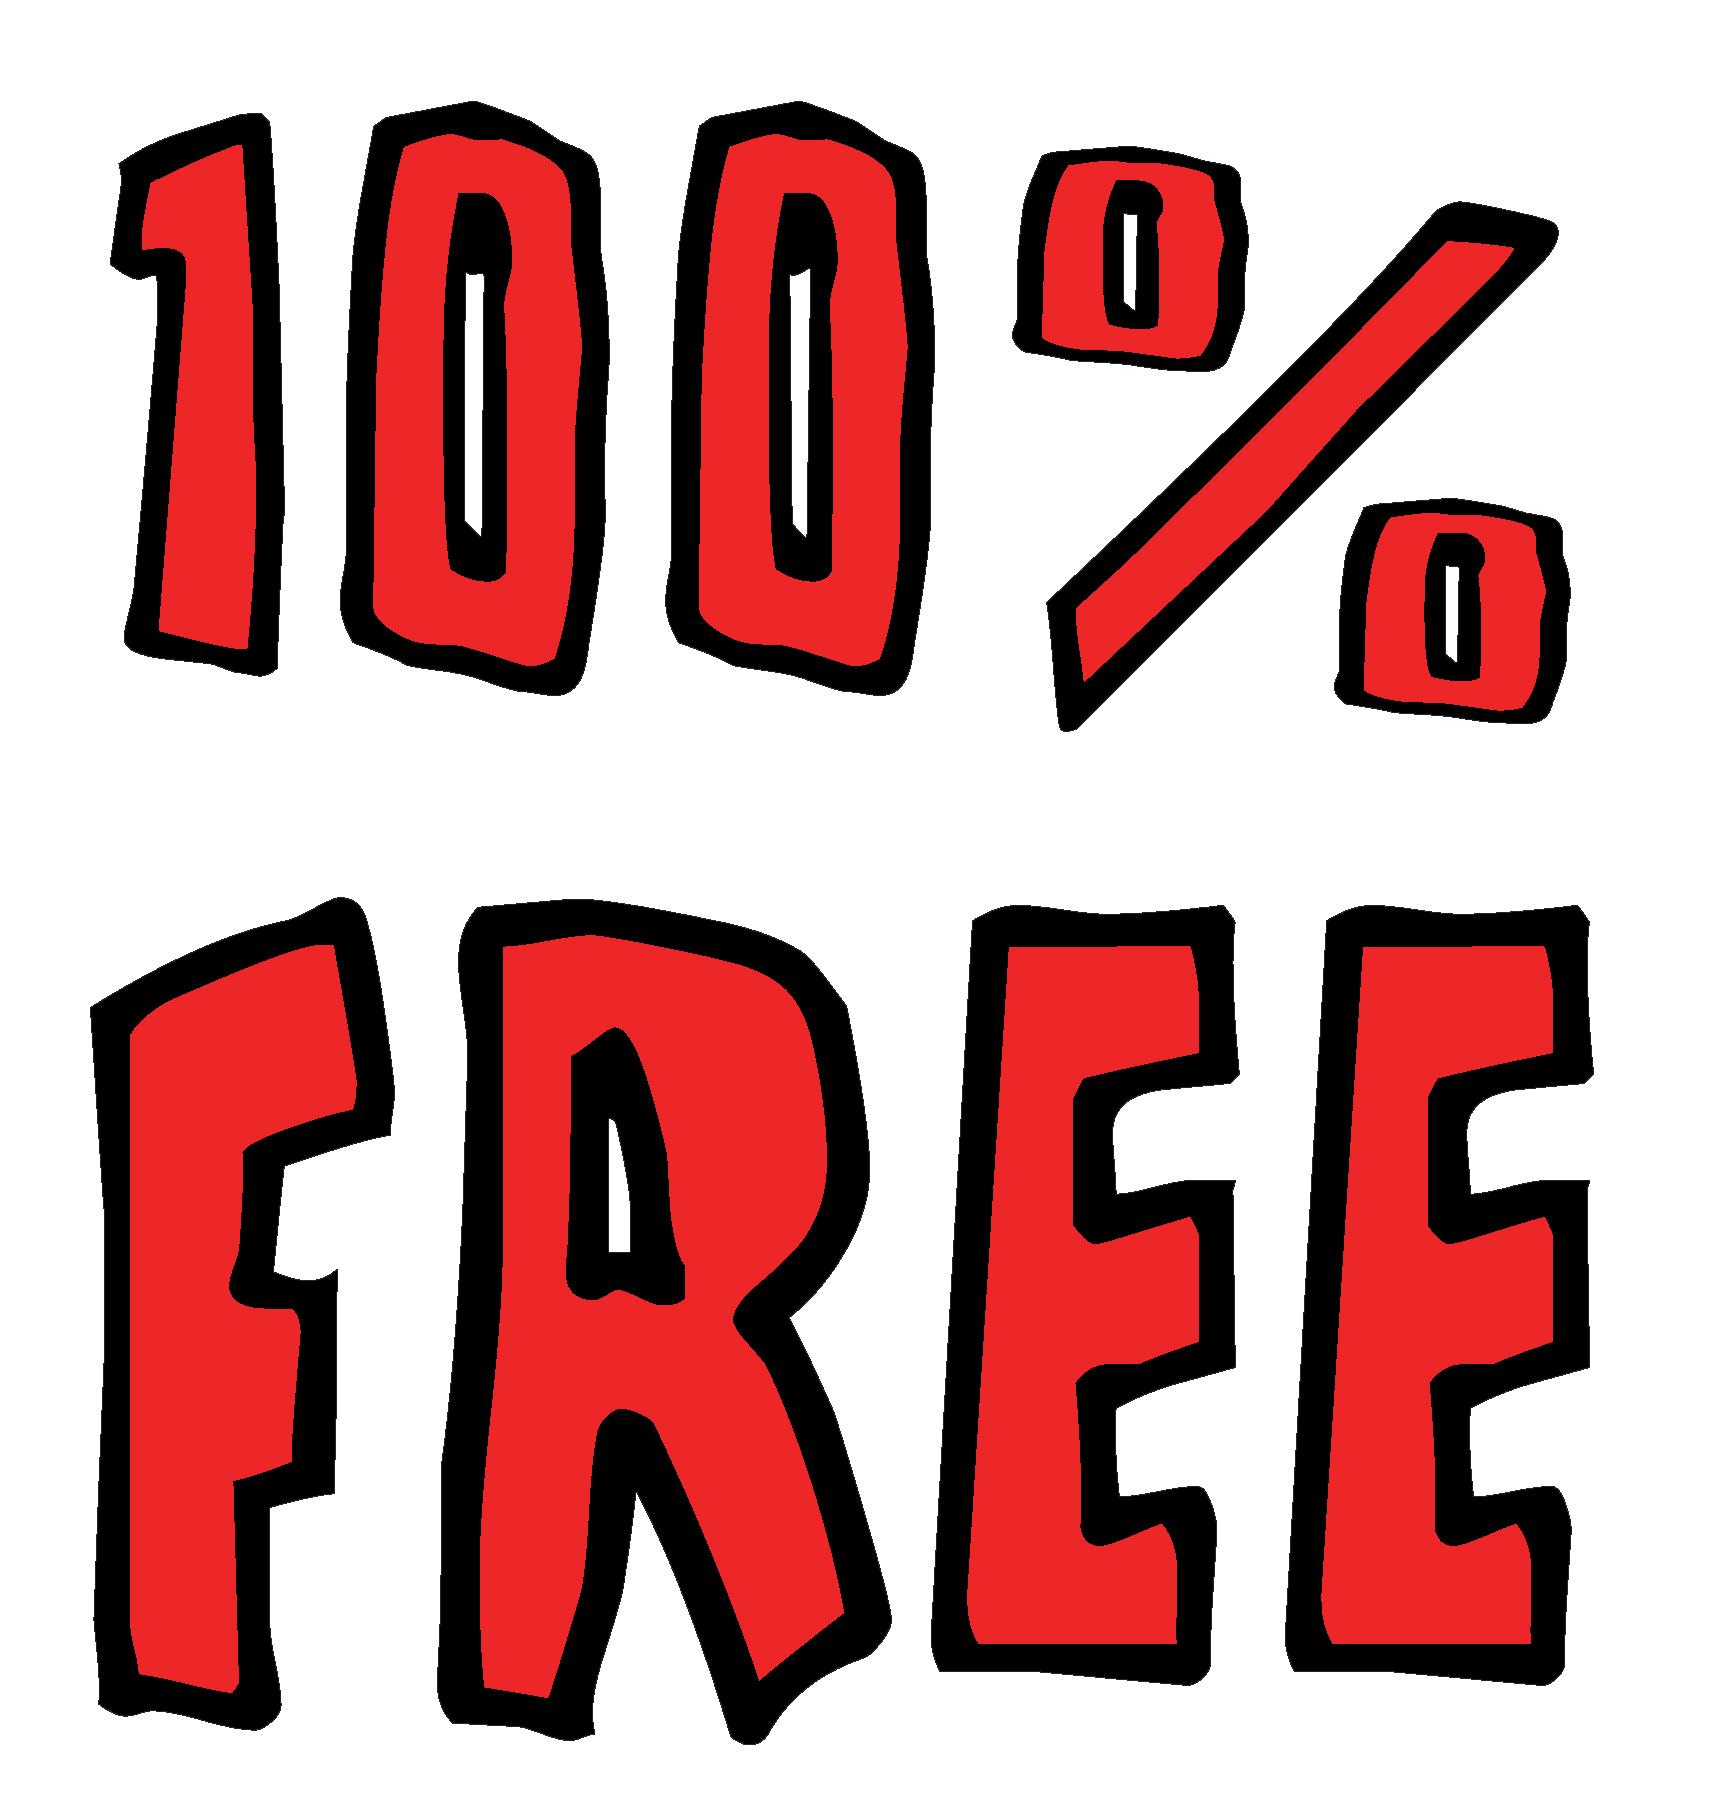 100 FREE (Red) (2).jpg